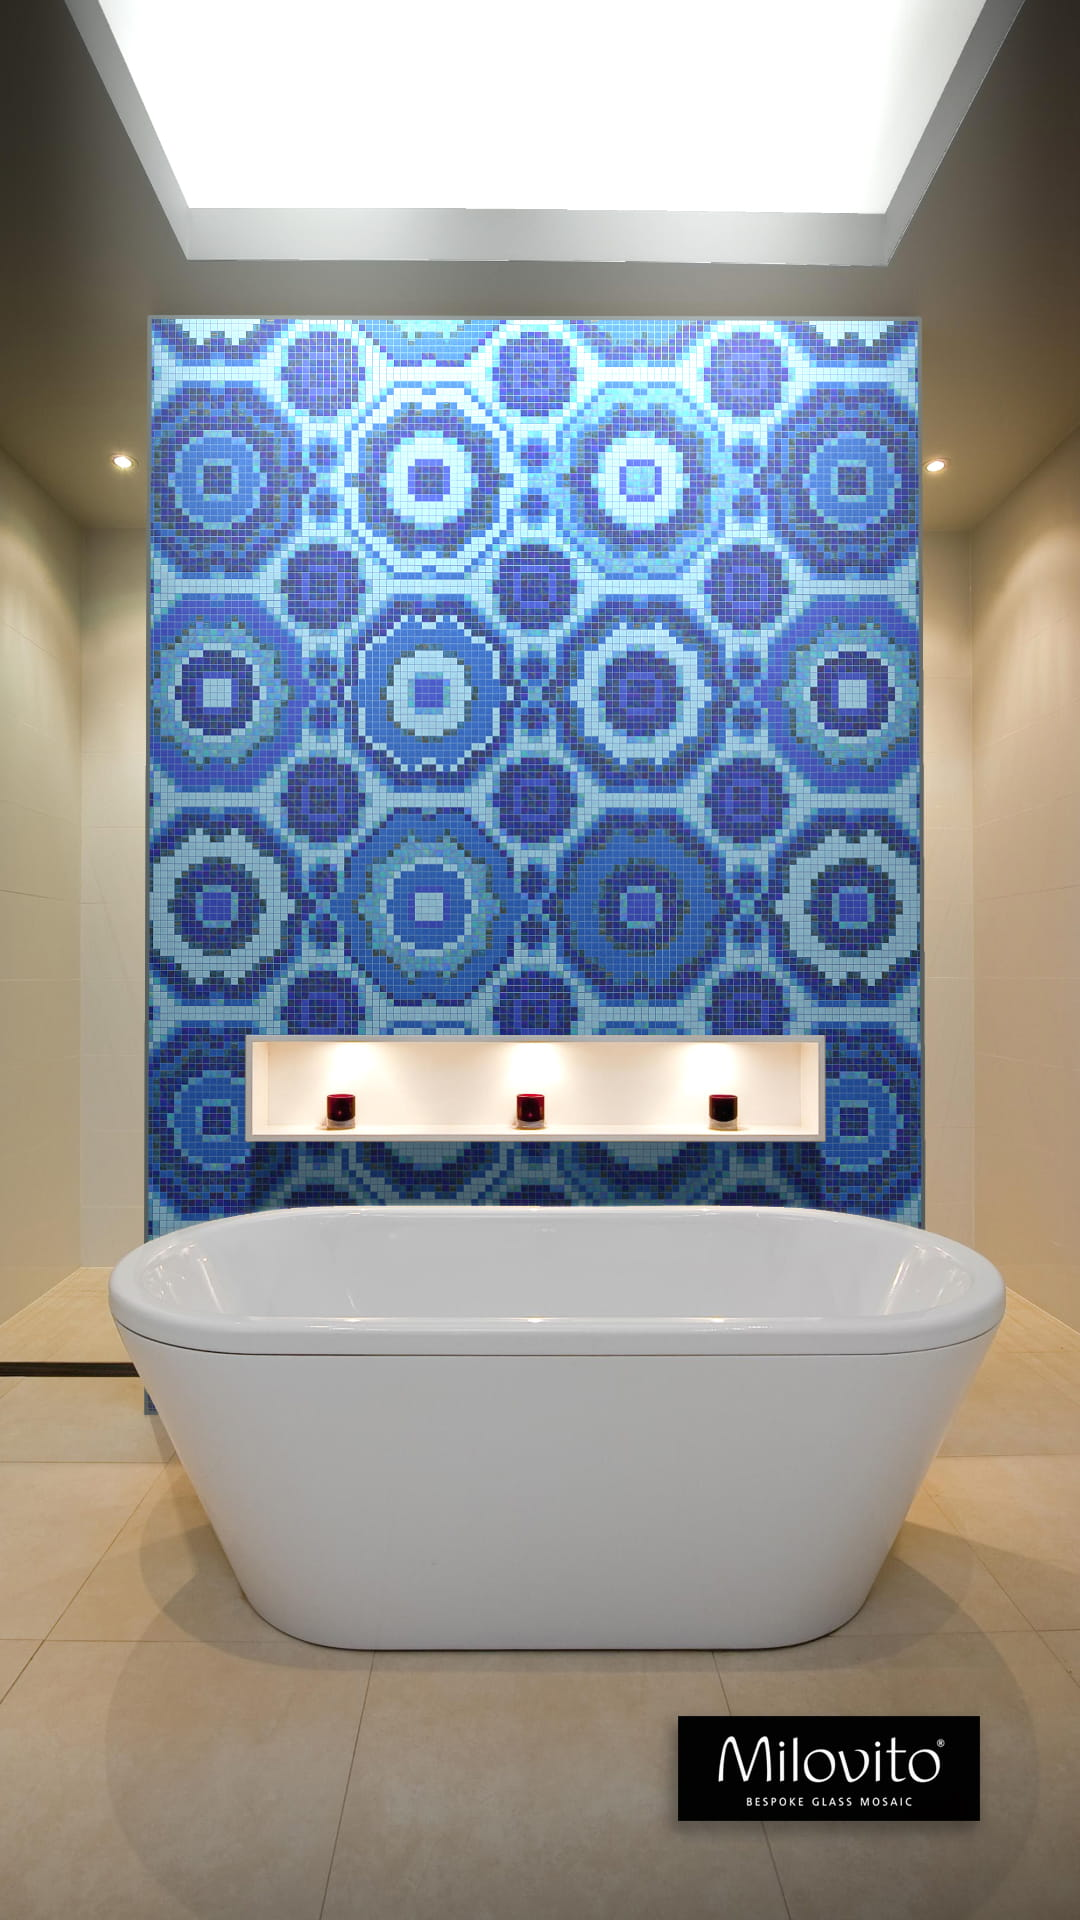 Delft Blue mosaic pattern circles bath